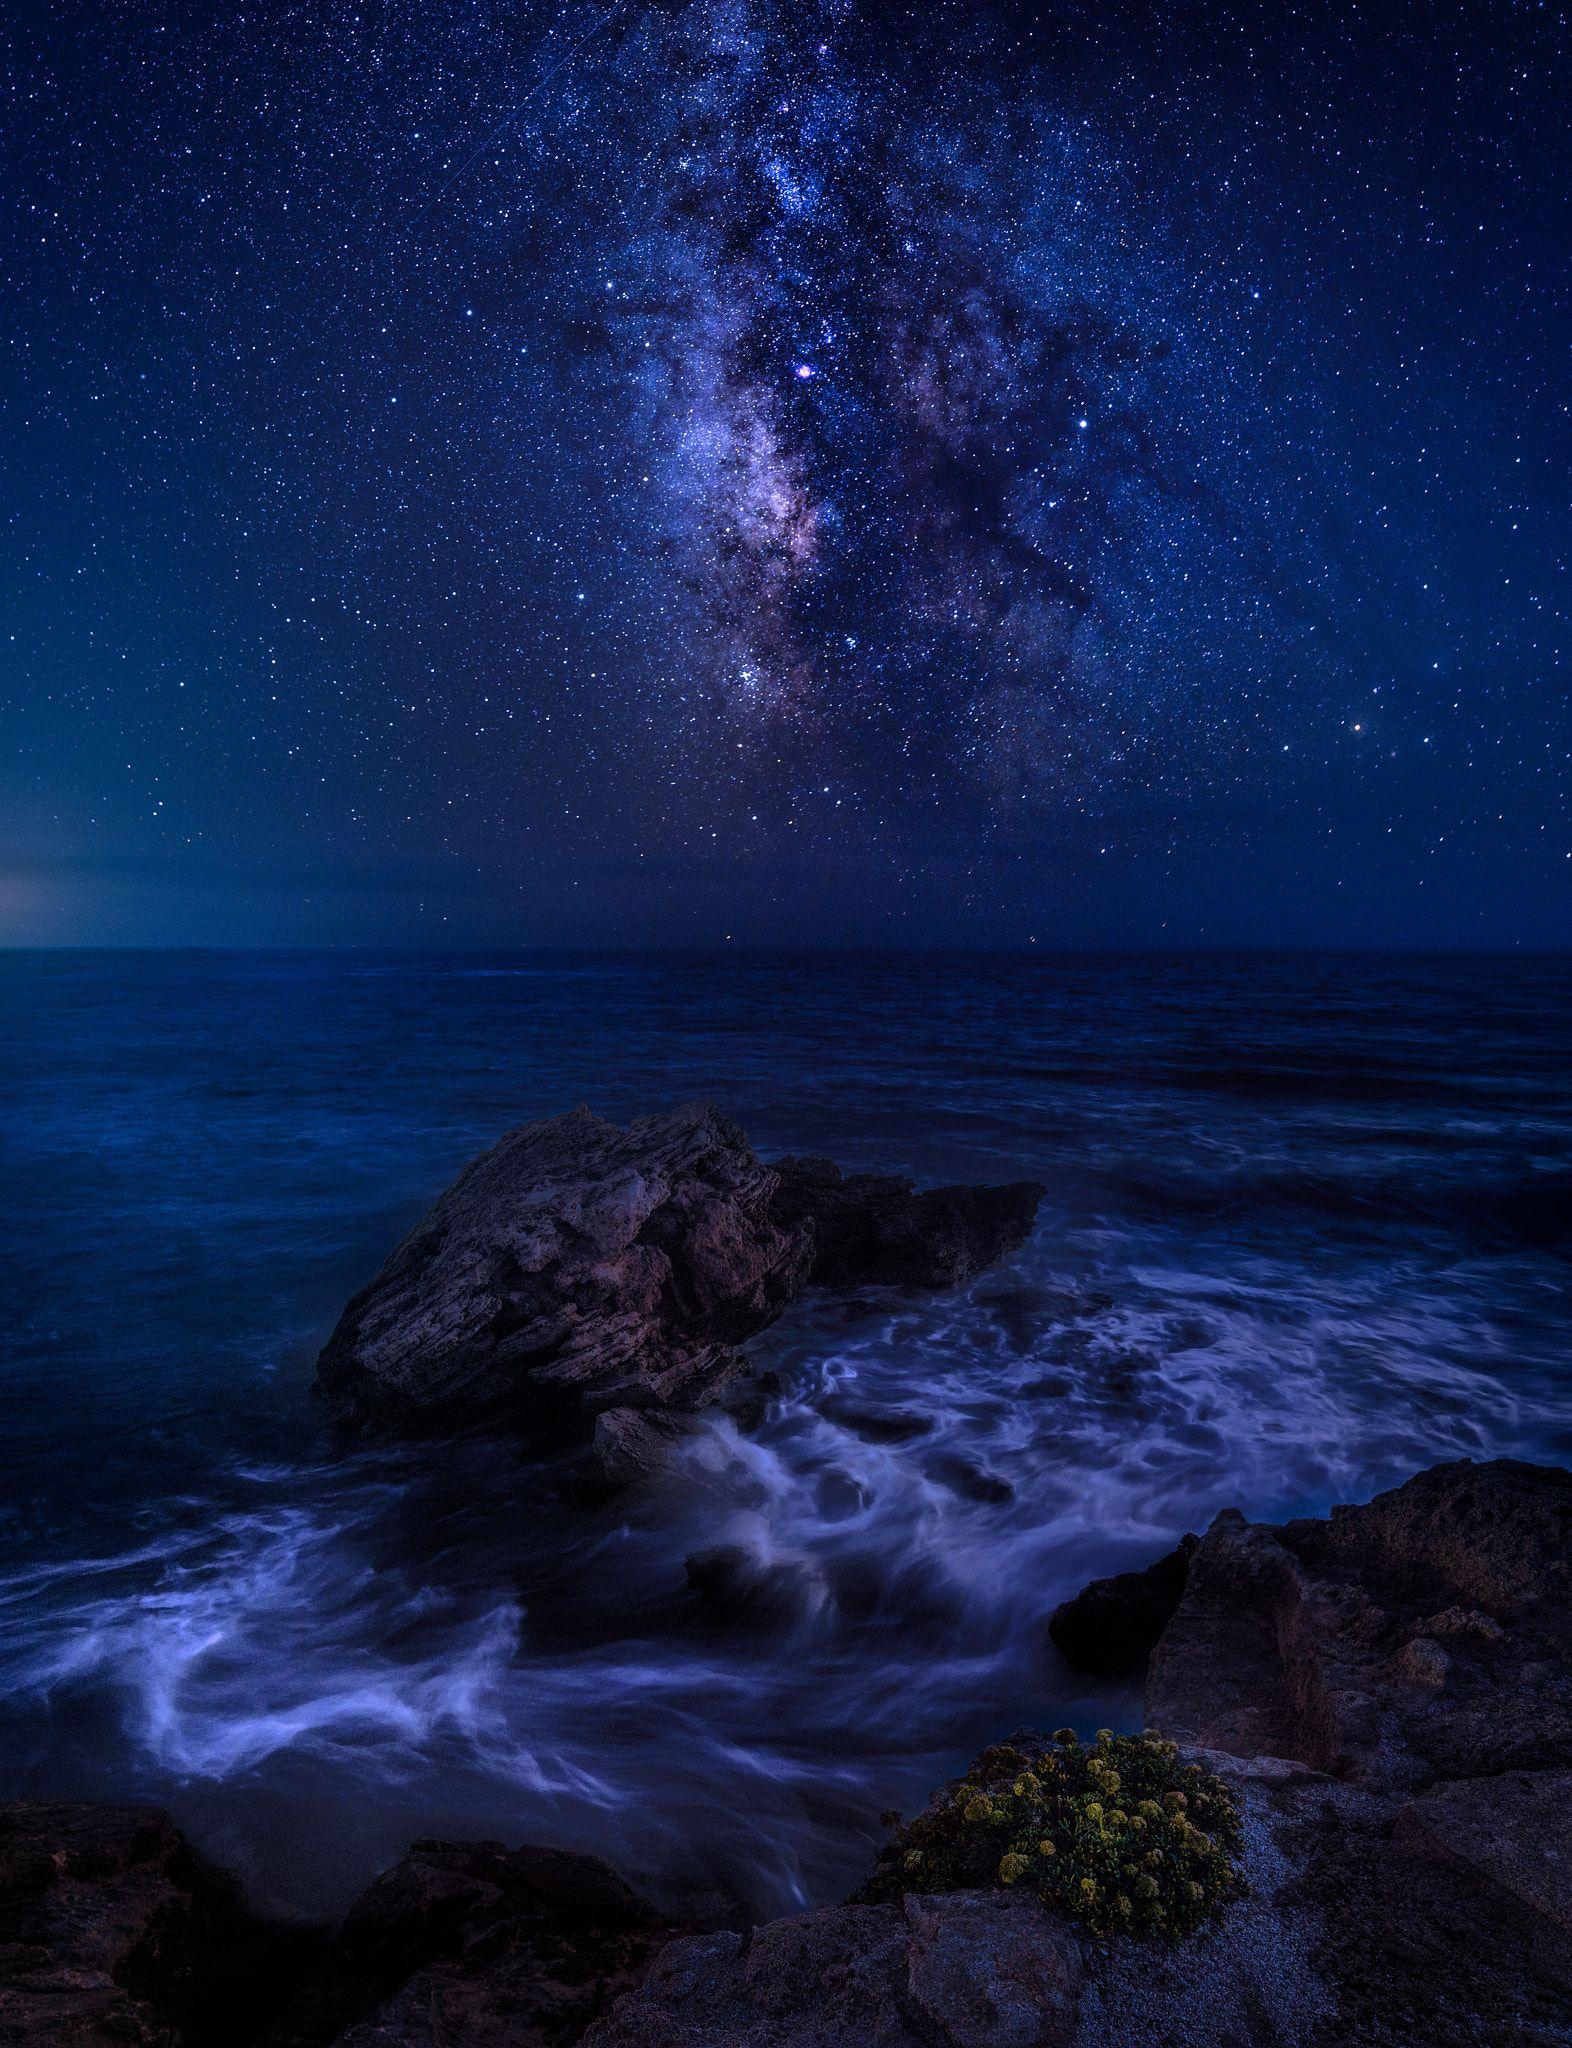 Magic Night Night Skies Sky Art Fantasy Landscape